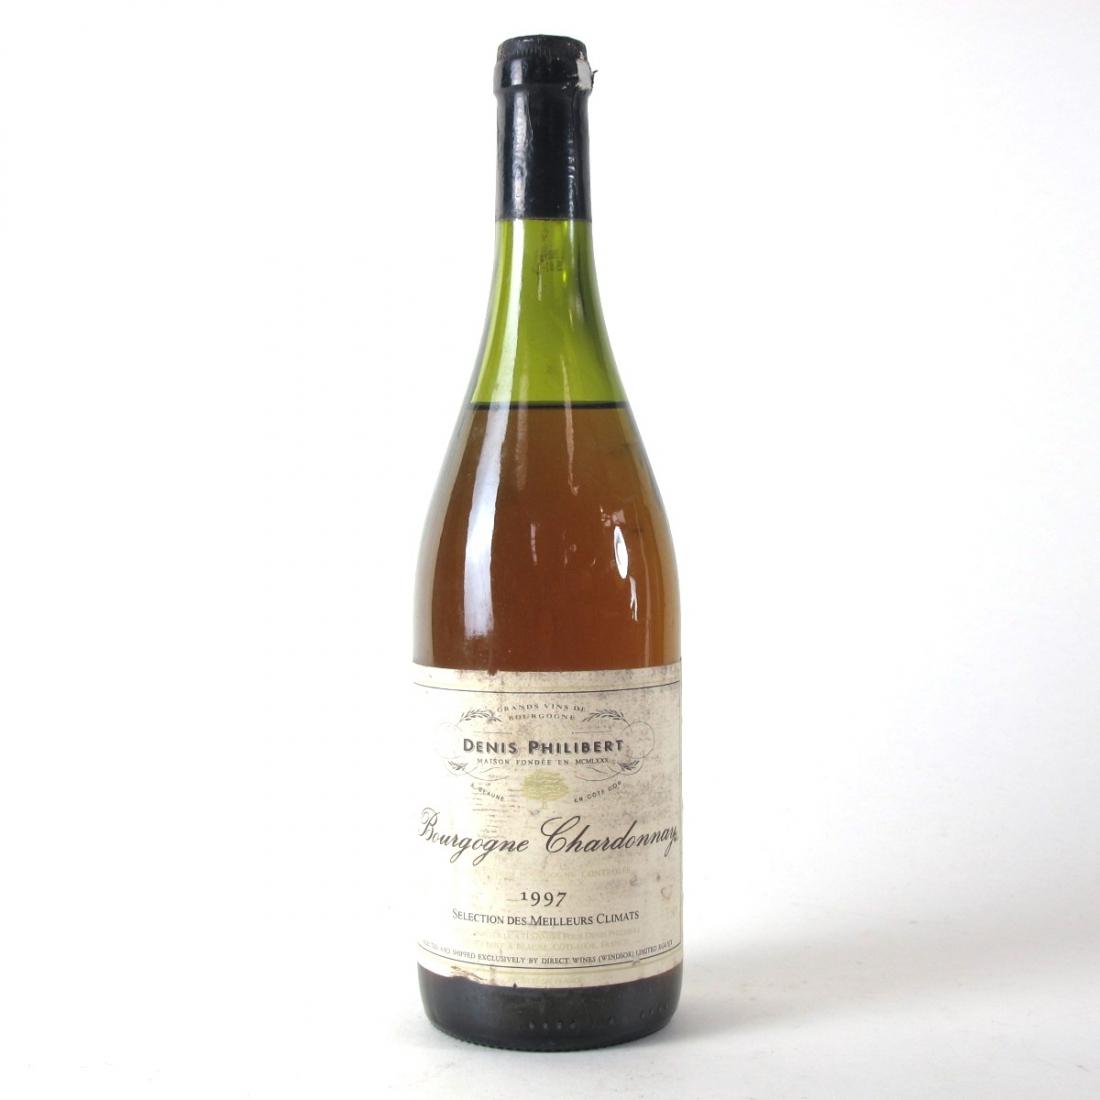 D.Philibert Chardonnay 1997 Bourgogne